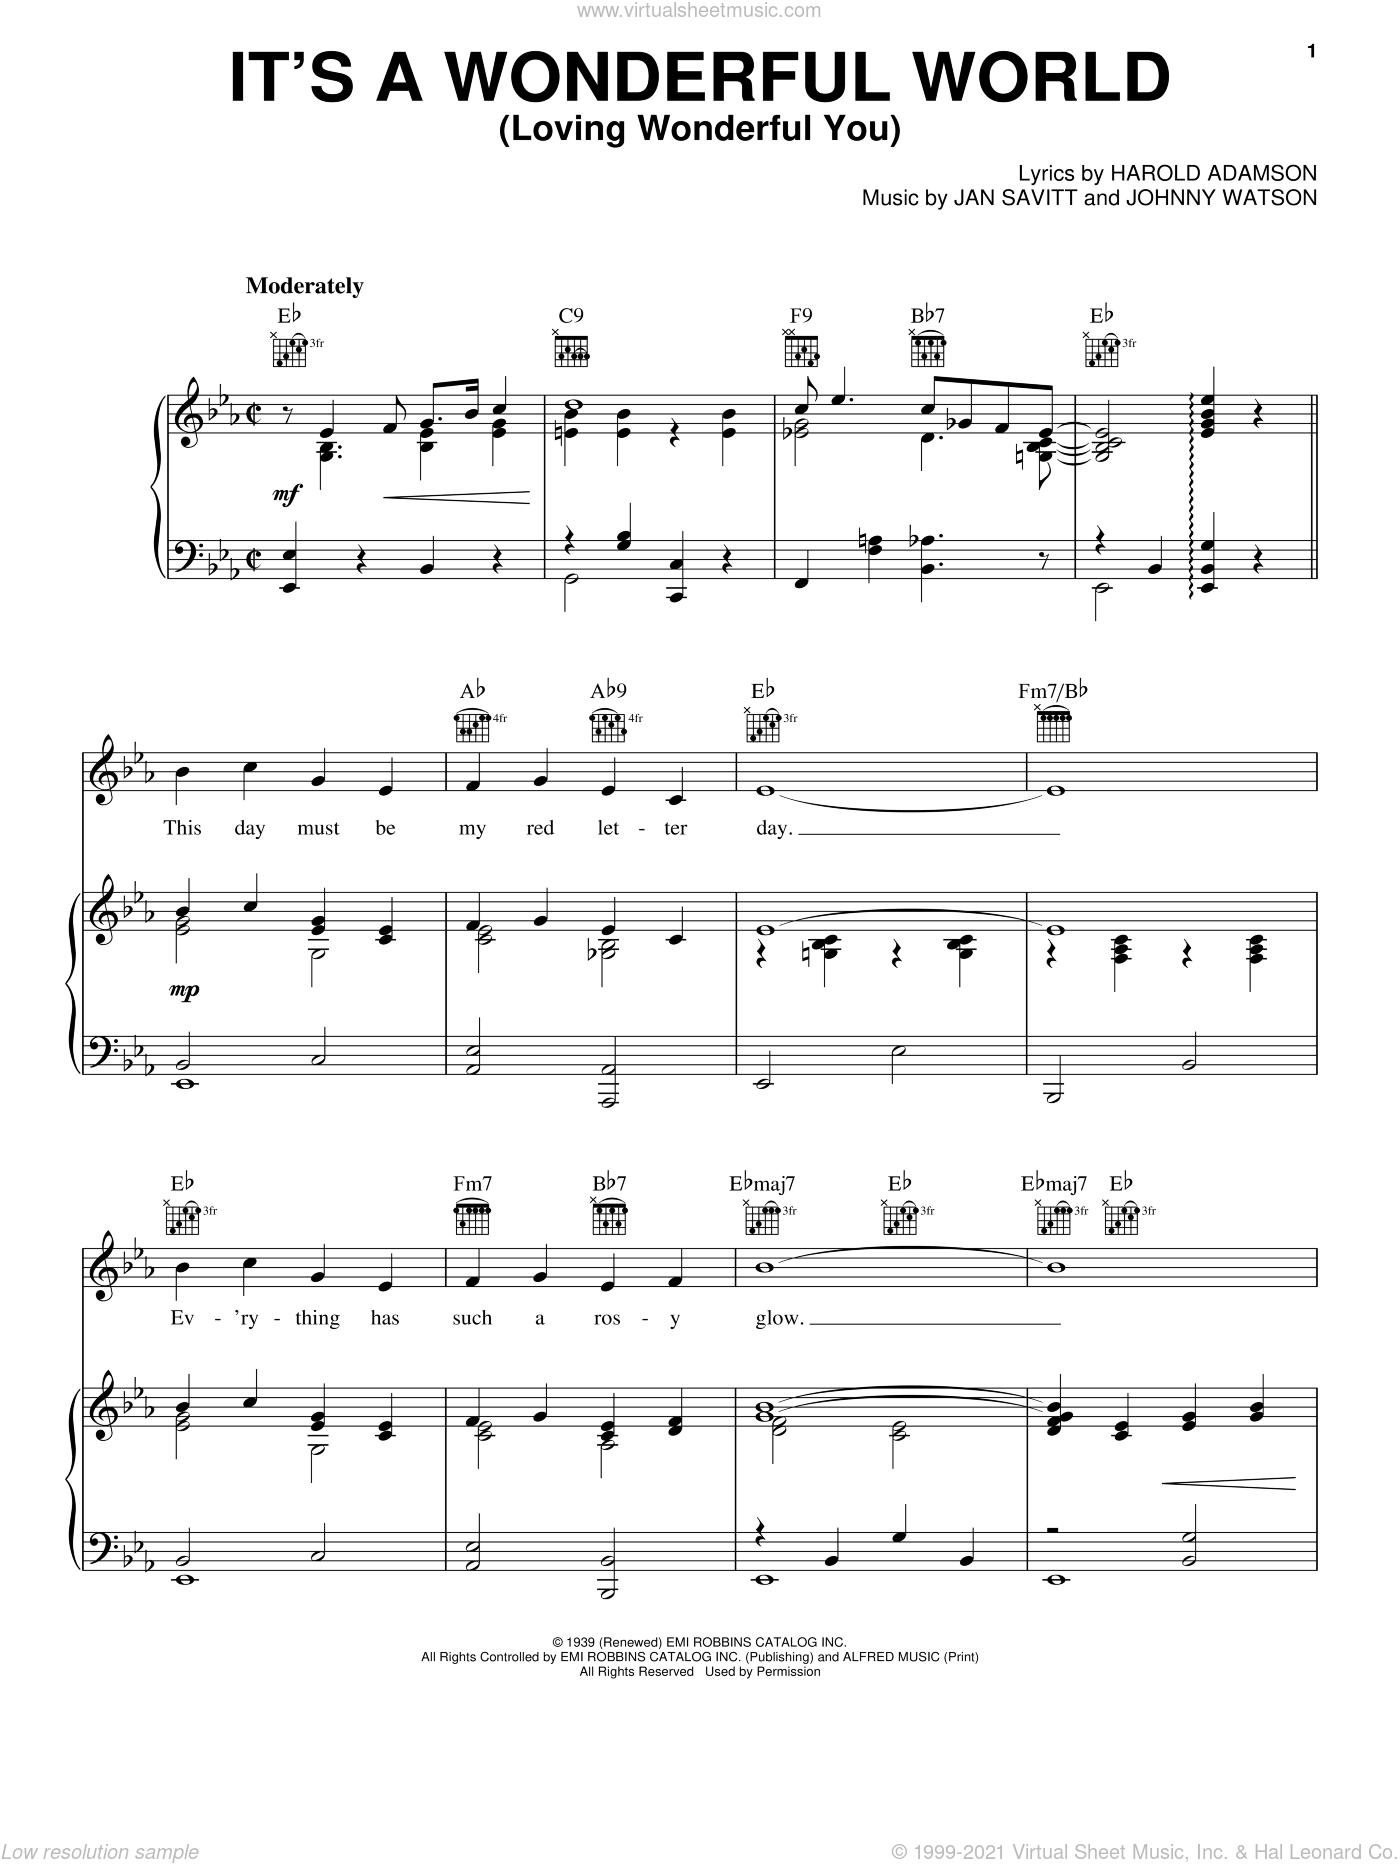 It's A Wonderful World (Loving Wonderful You) sheet music for voice, piano or guitar by Frank Sinatra, Harold Adamson, Jan Savitt and Johnny Watson, intermediate skill level